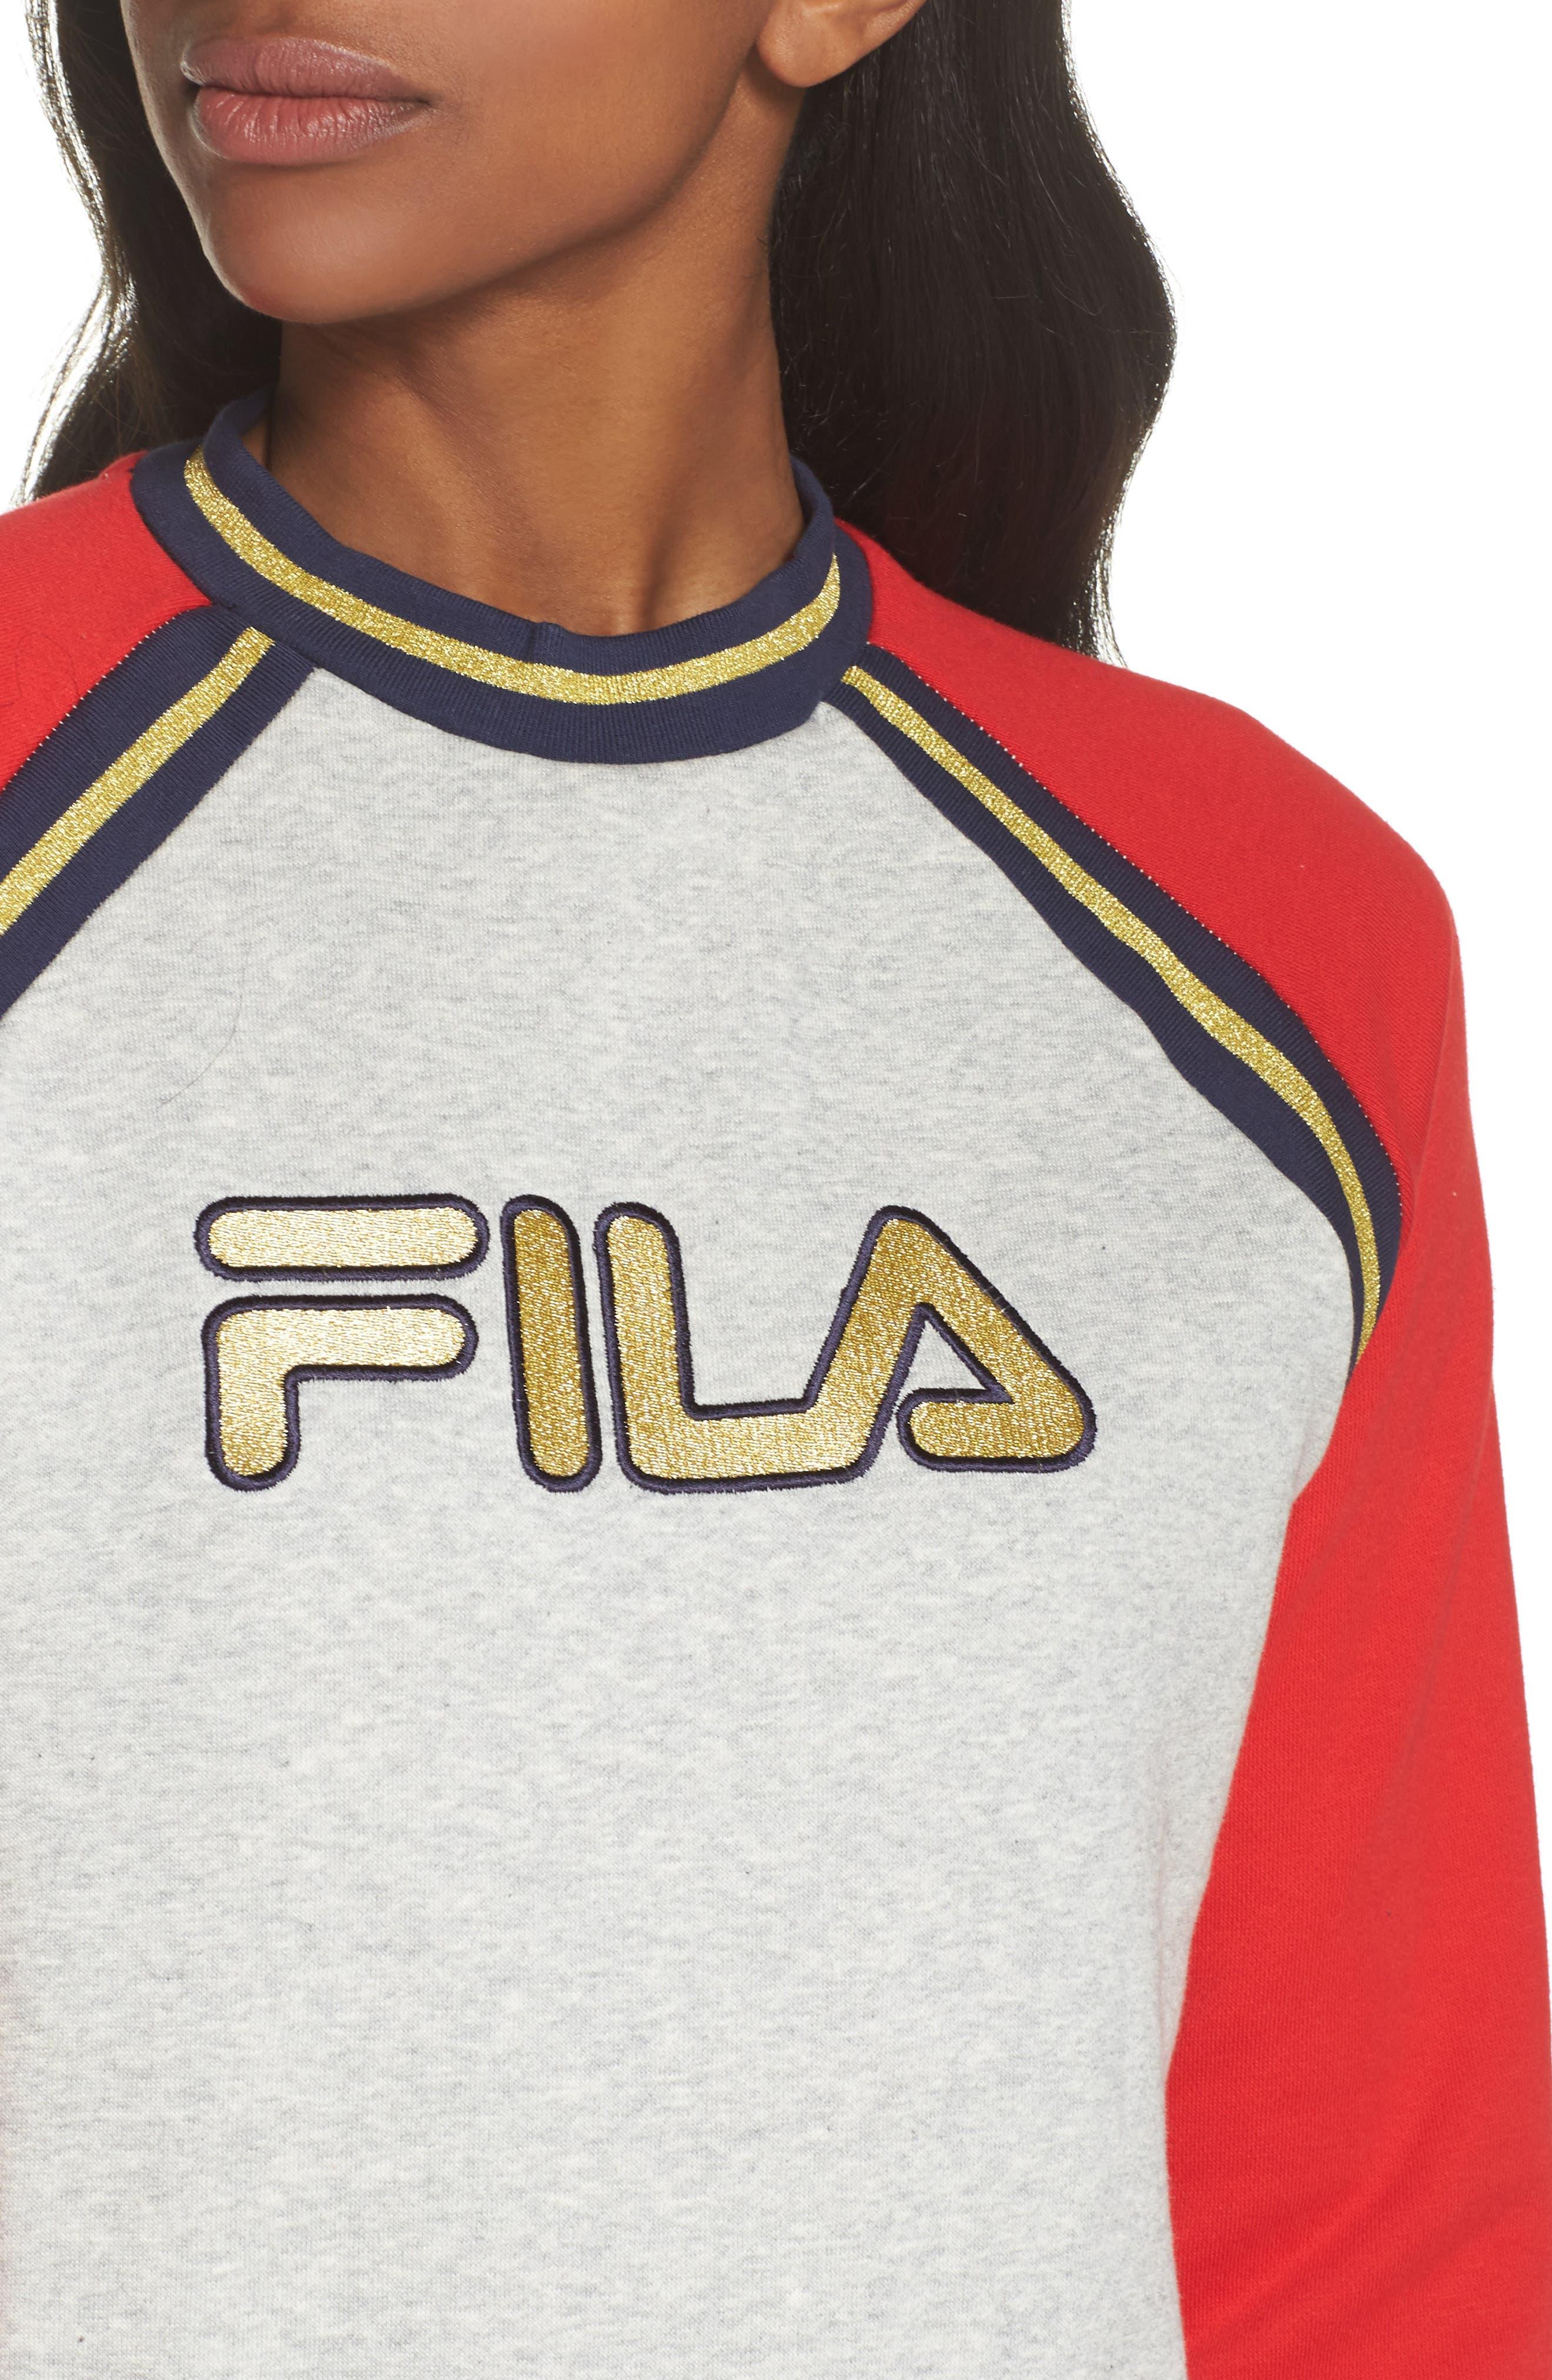 Rafaella Sweatshirt,                             Alternate thumbnail 4, color,                             Light Grey / Peacoat/ Red